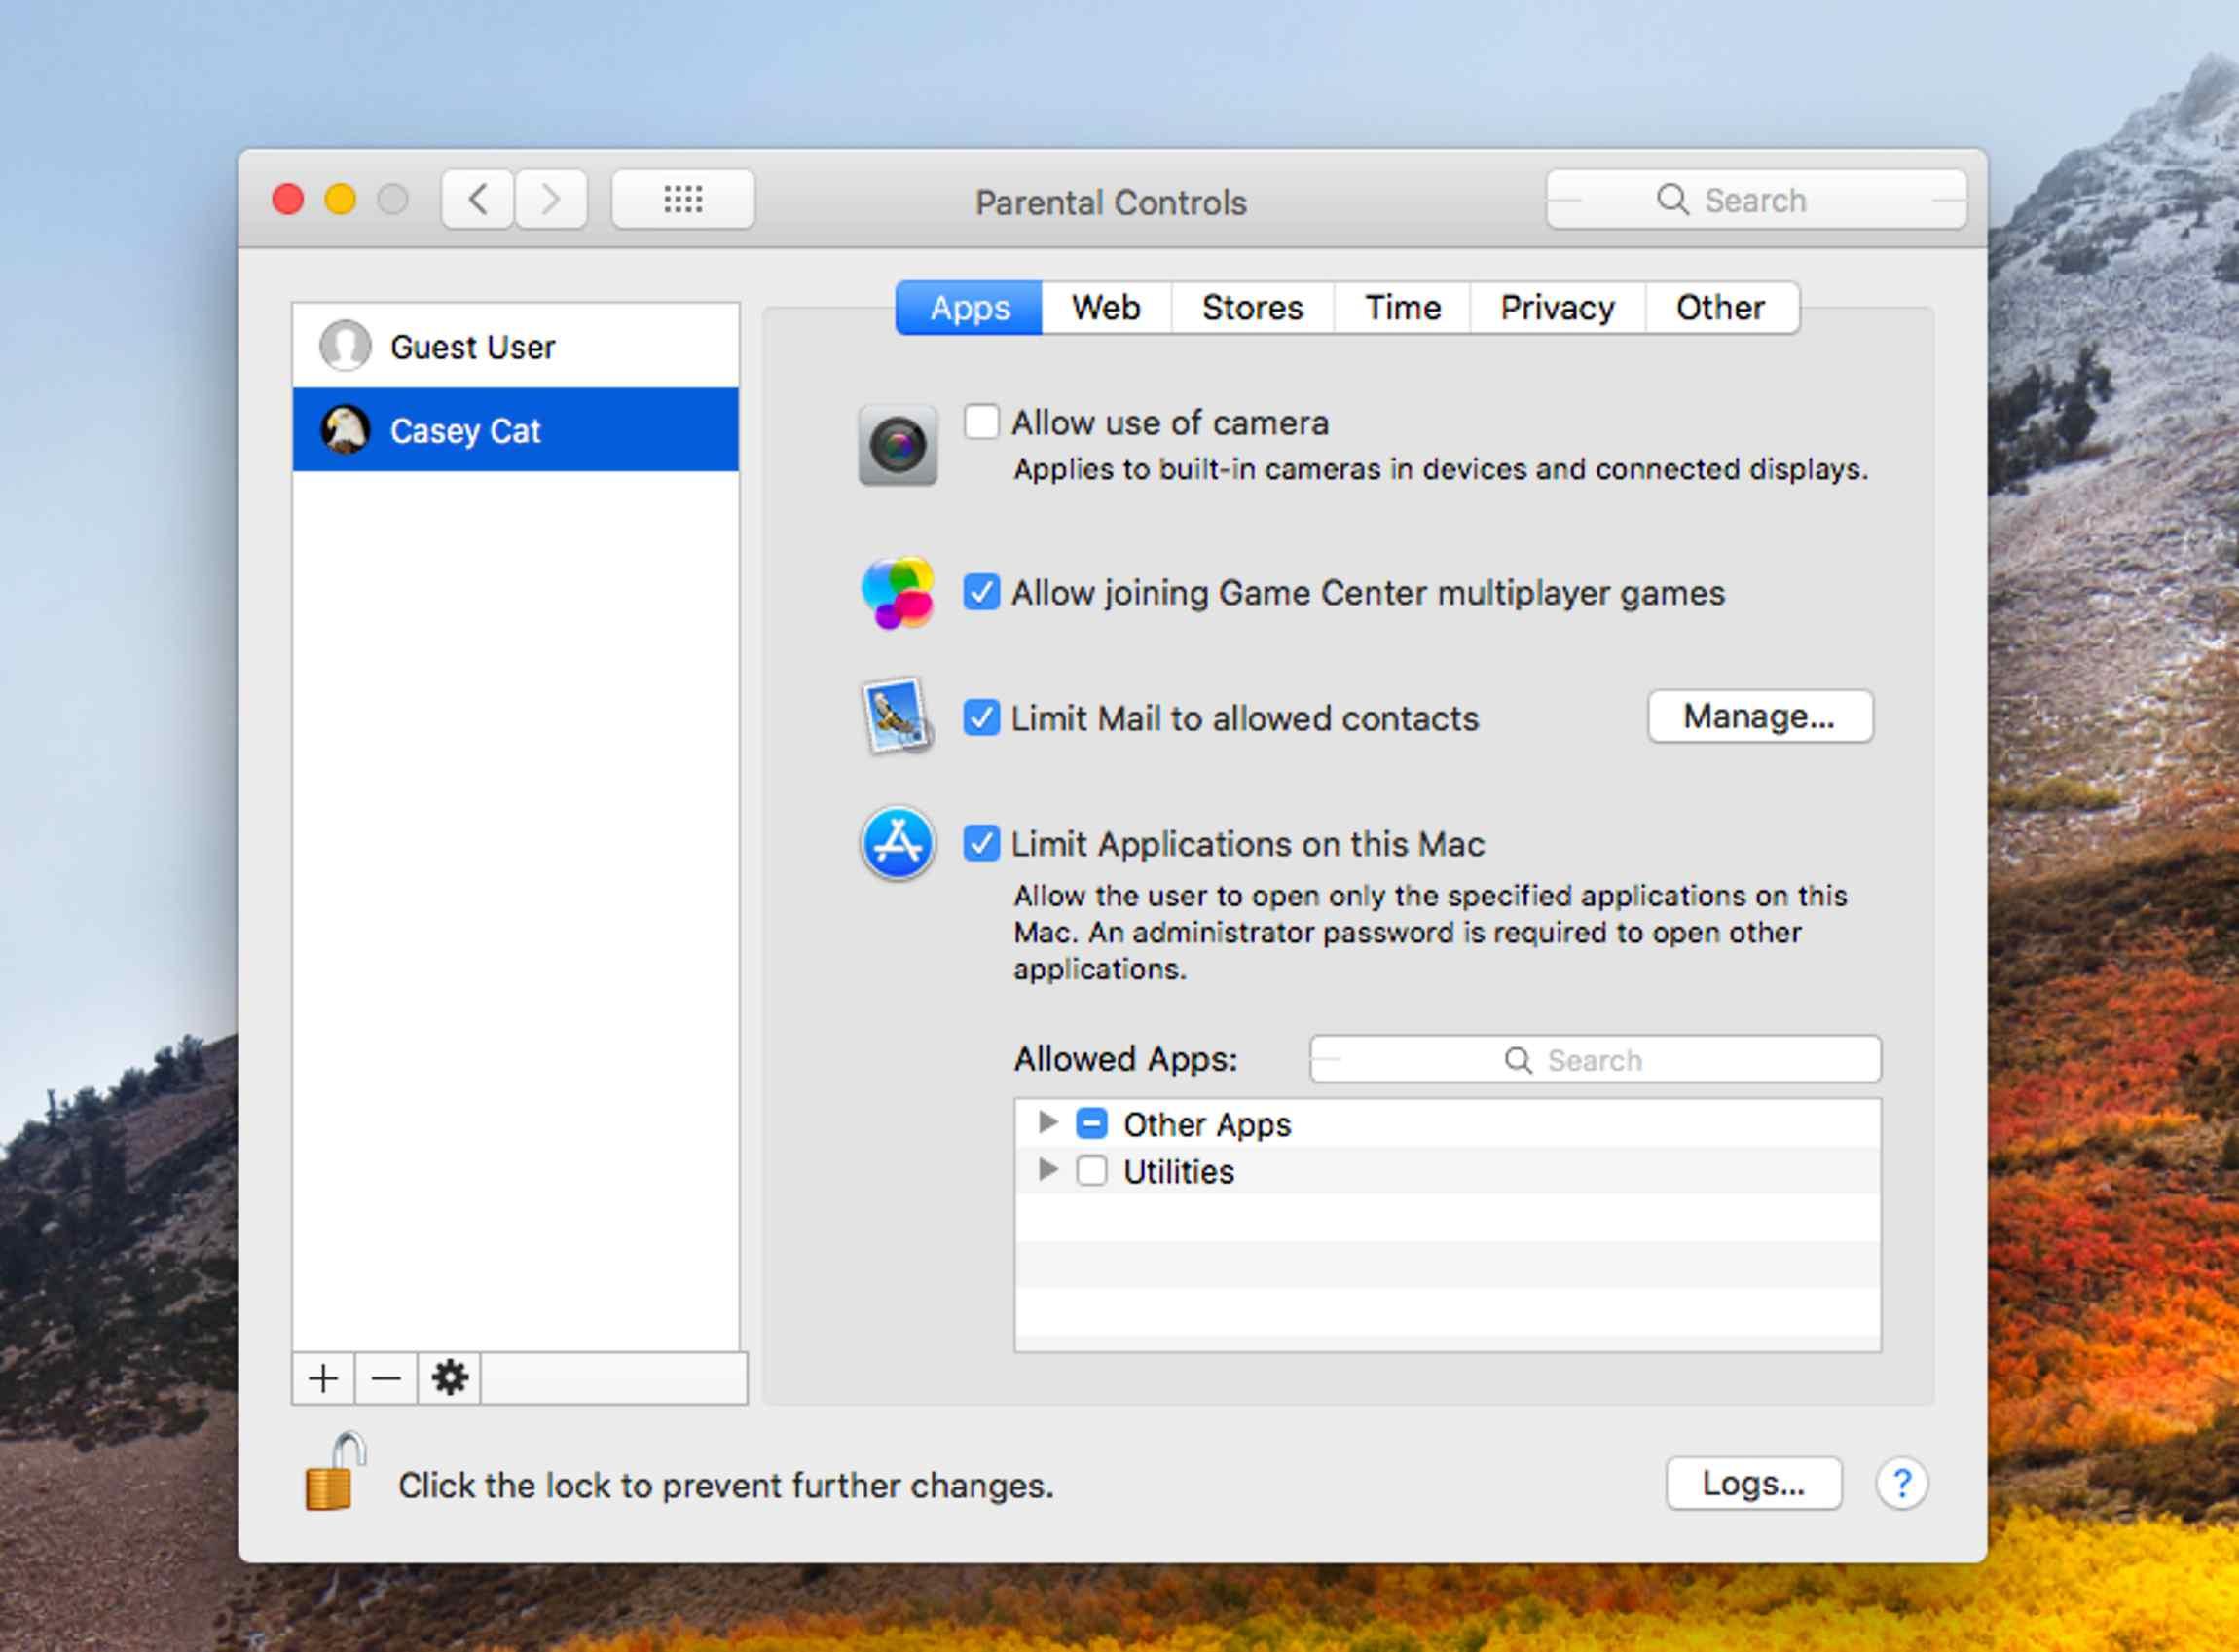 Parental controls in macOS